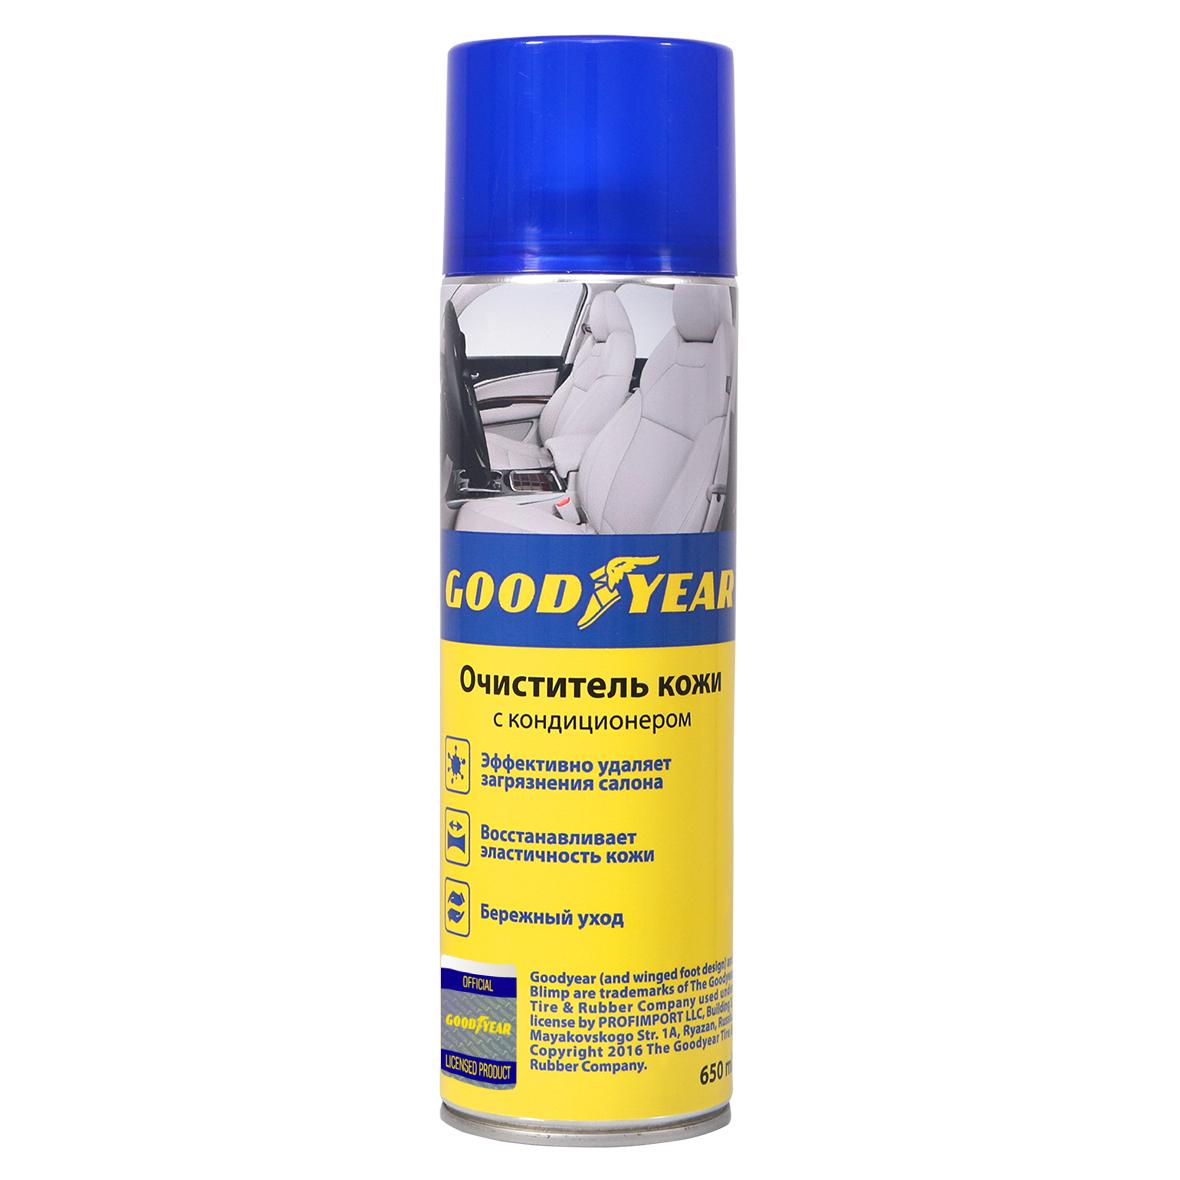 Очиститель Goodyear Gy000710